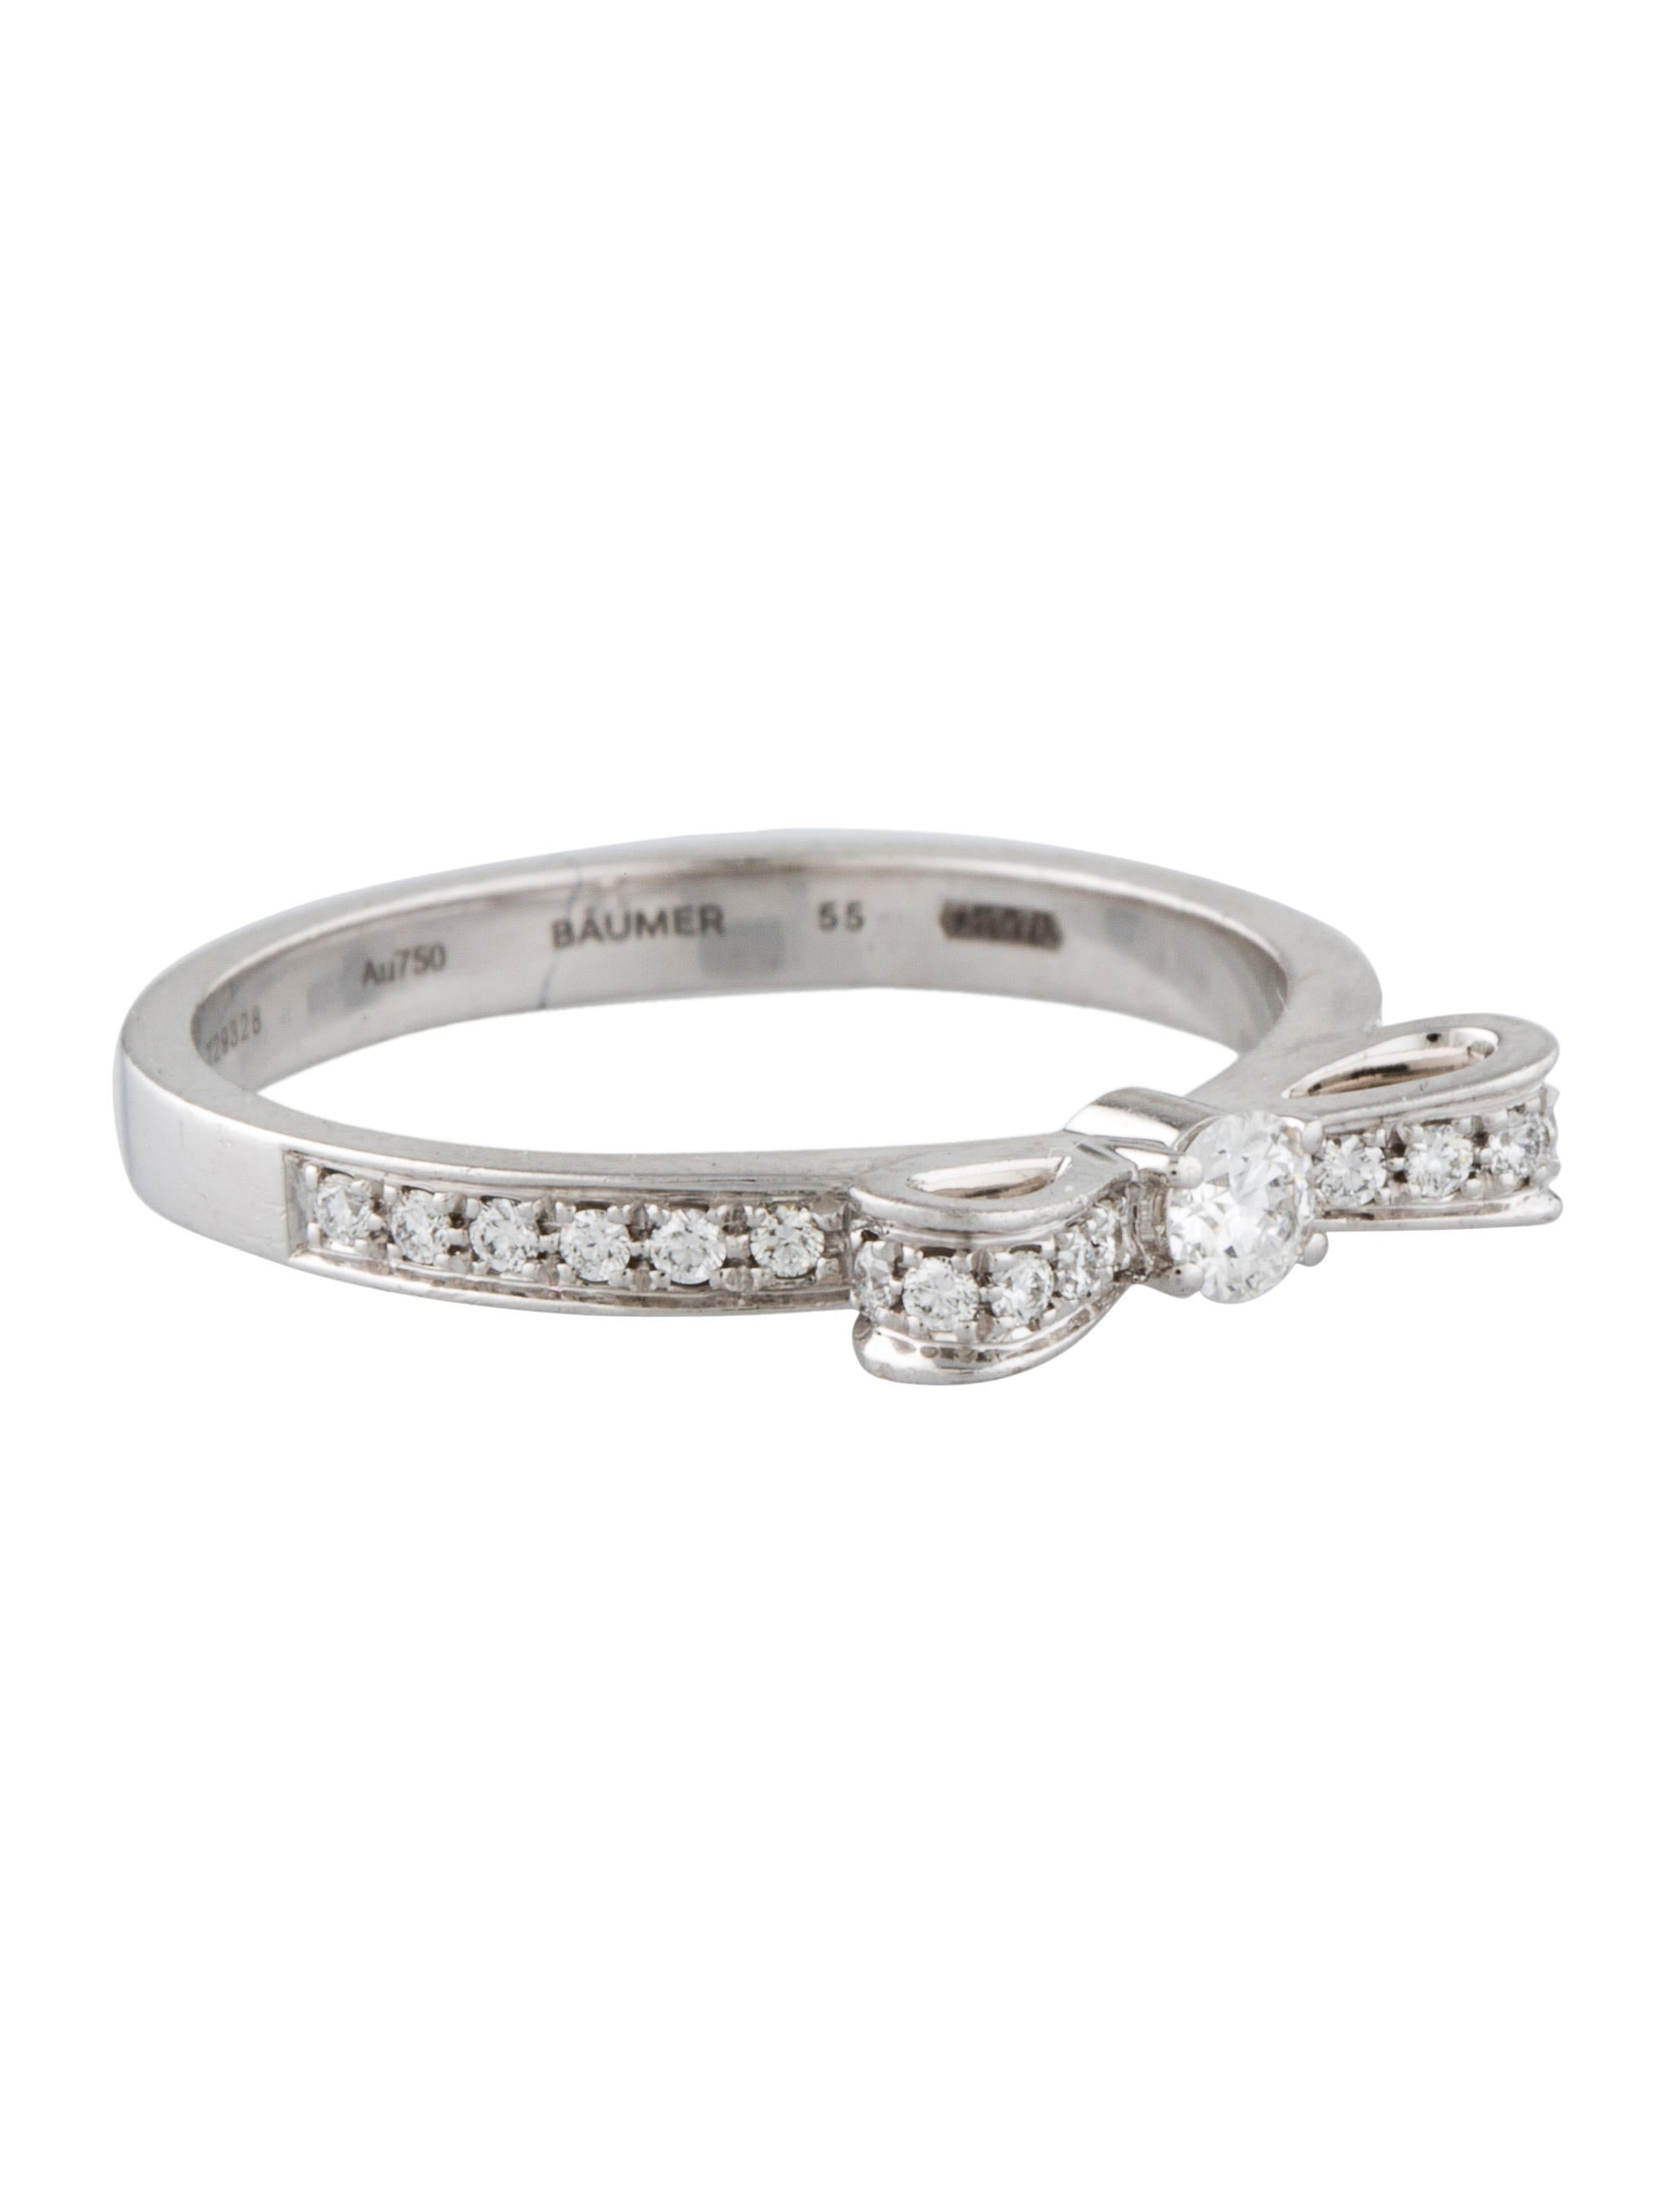 Chanel Diamond Bow Ring Rings CHA